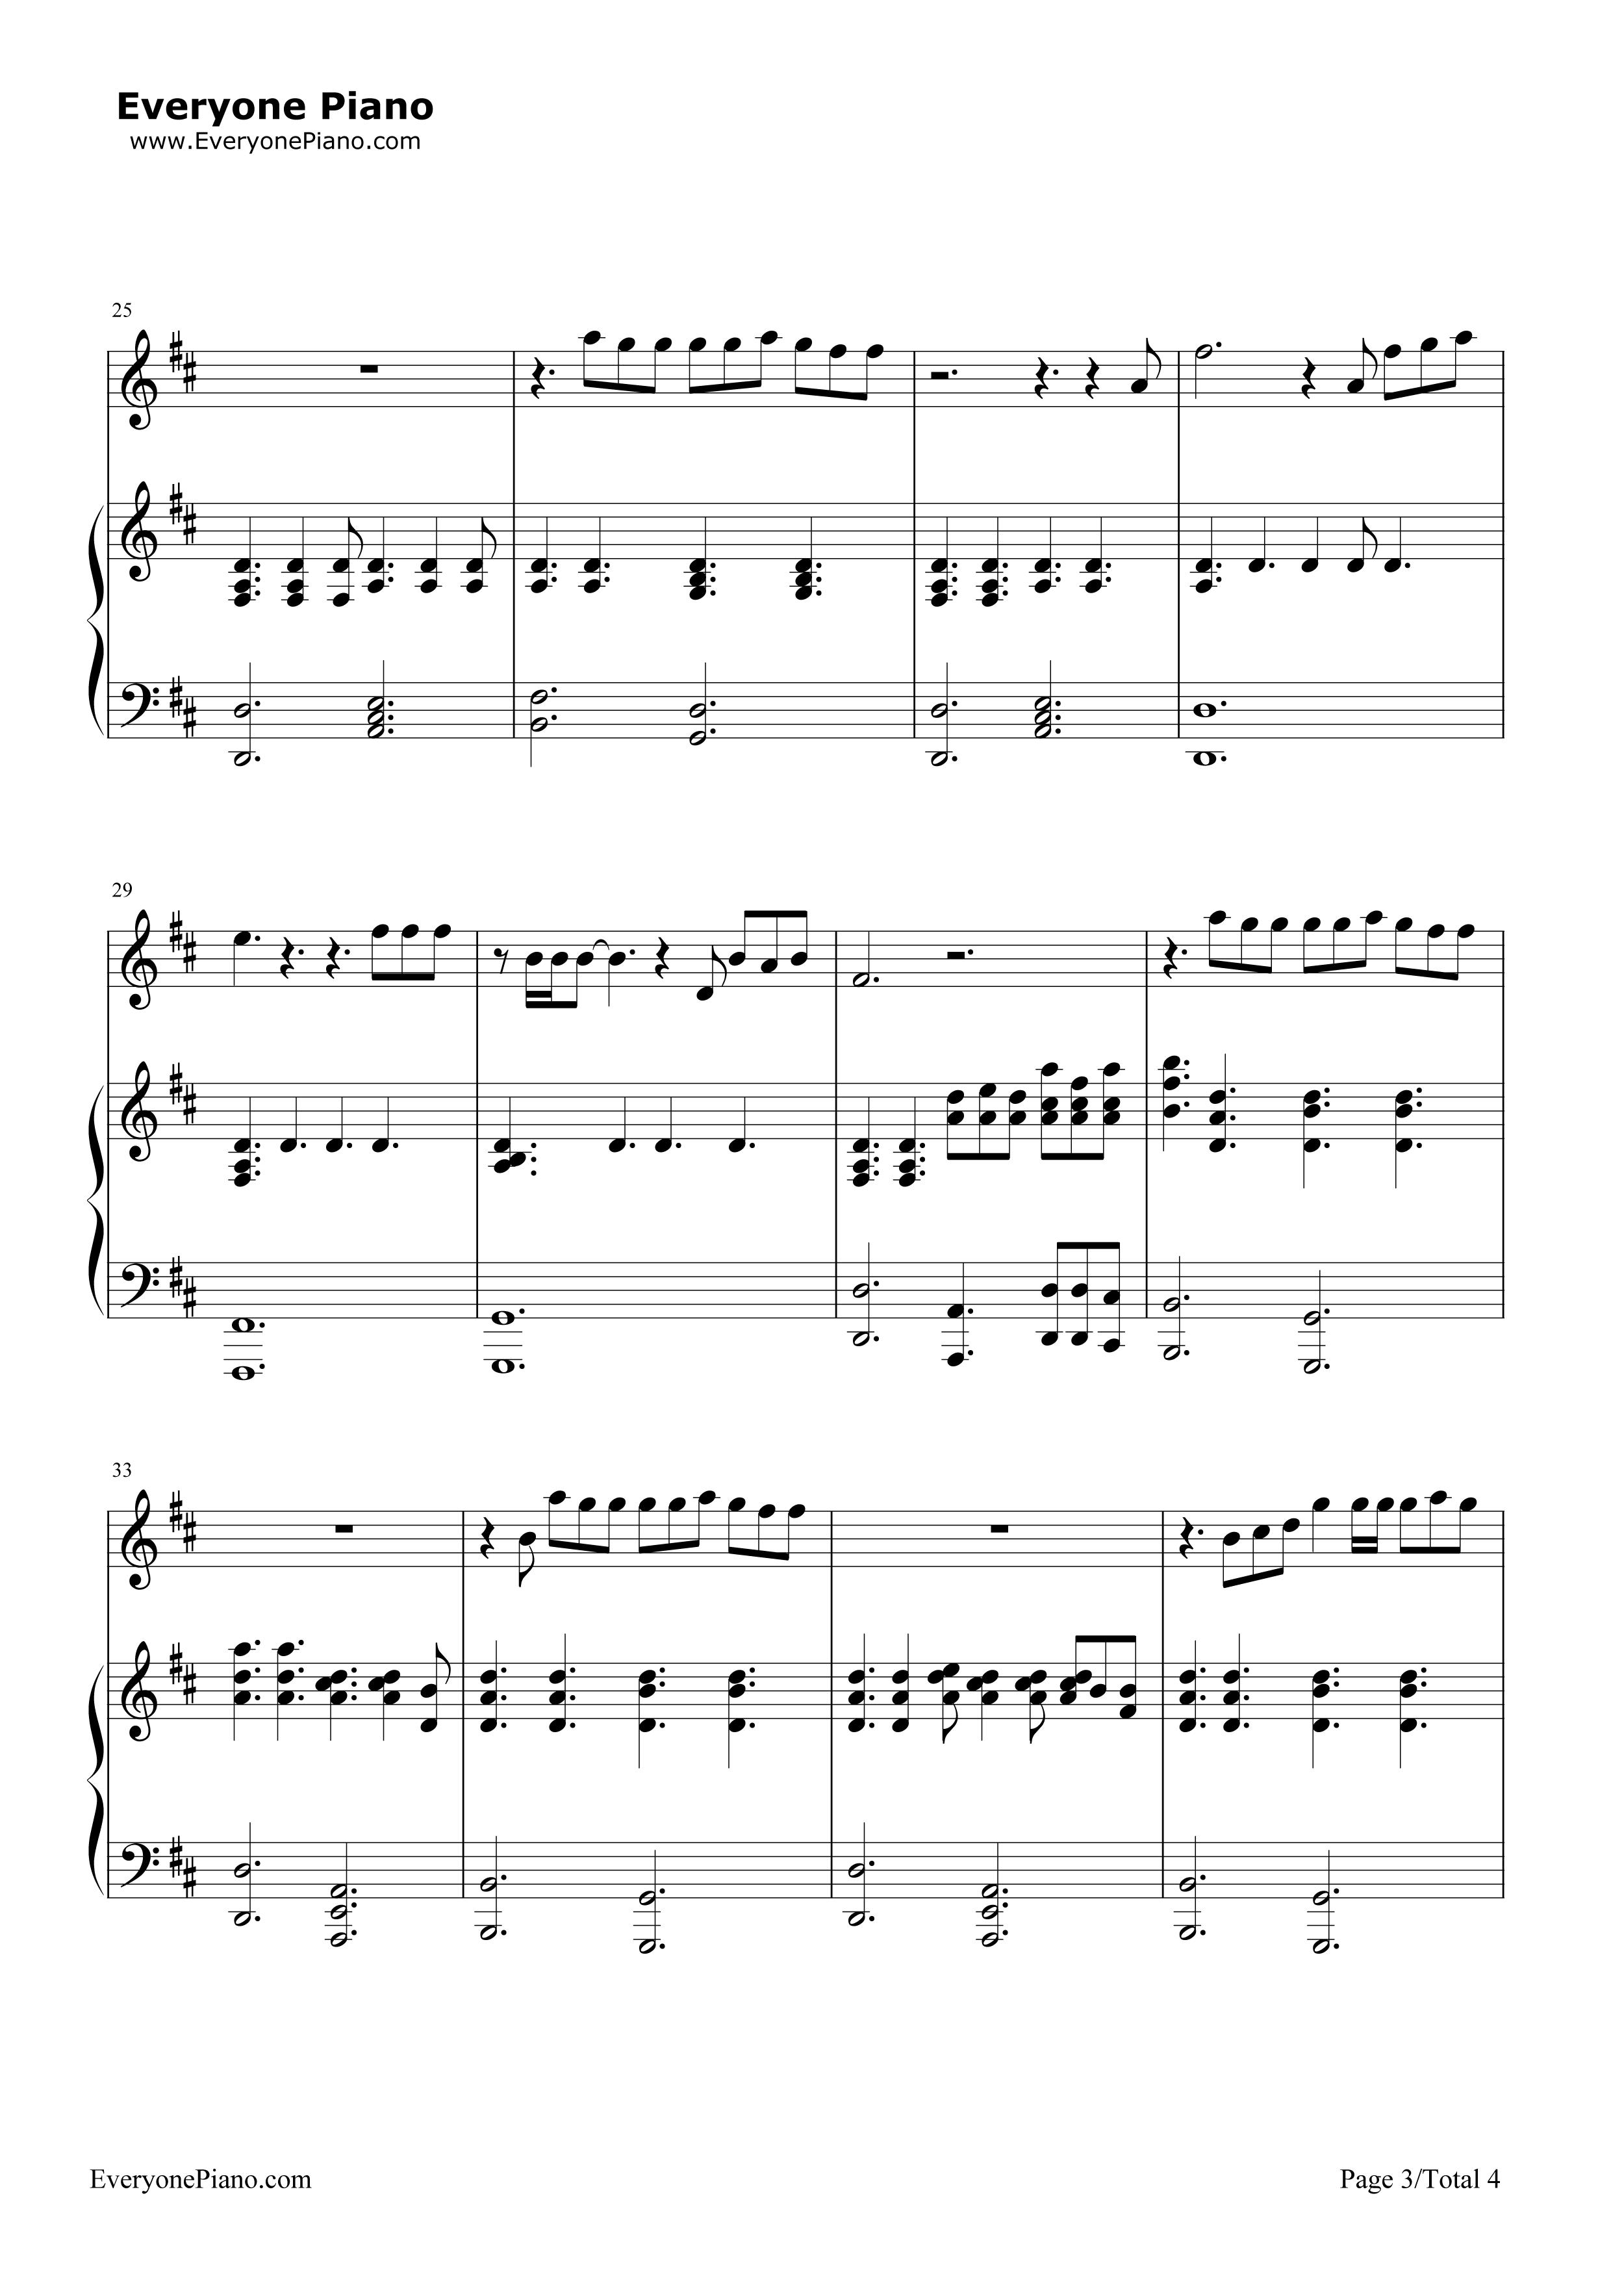 Say Something Chords Piano Sheet Music Free - say something piano sheet music a great big world ...